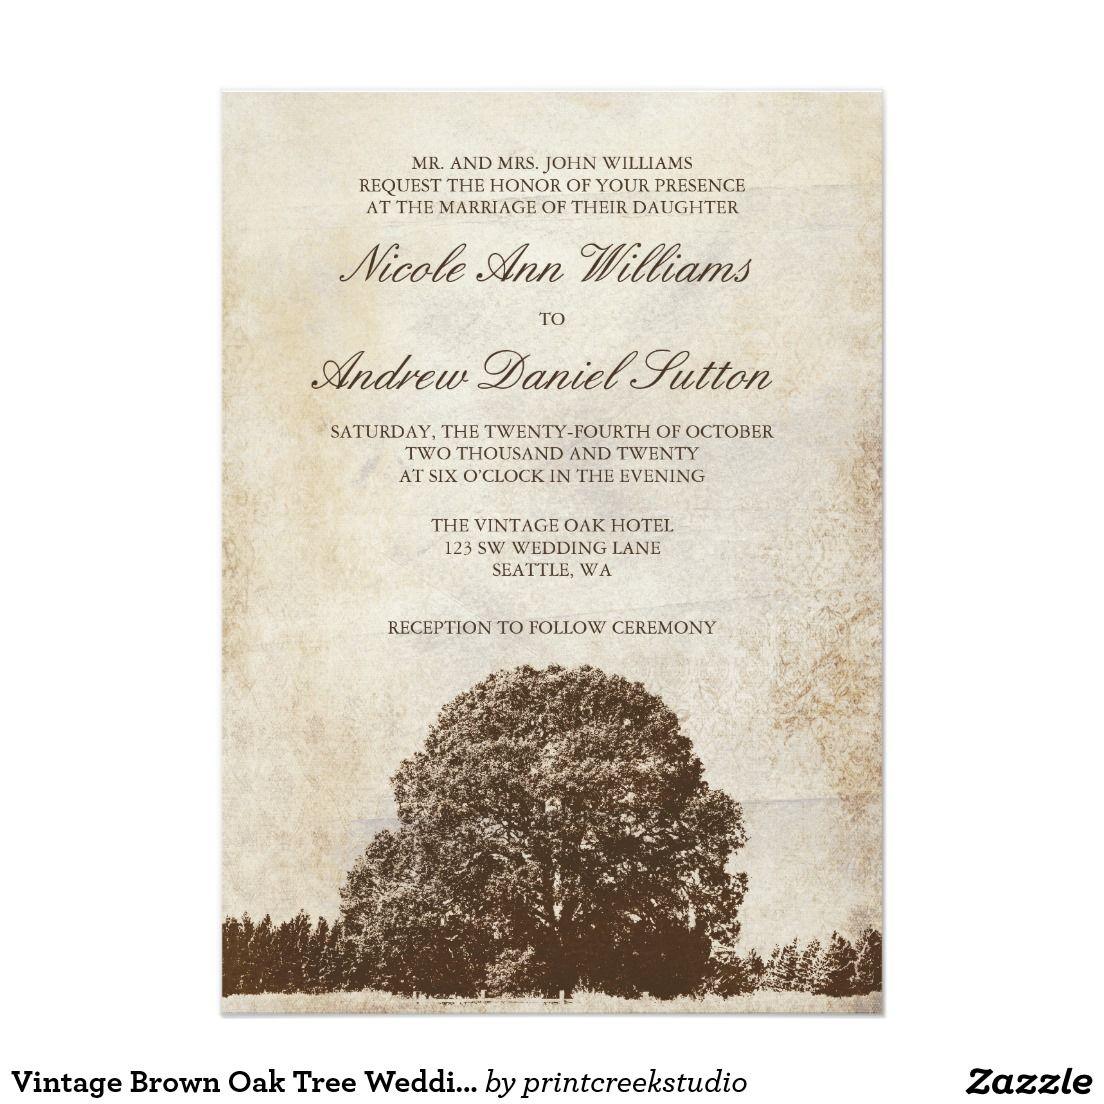 Vintage Brown Oak Tree Wedding Invitations | Pinterest | Bridal ...